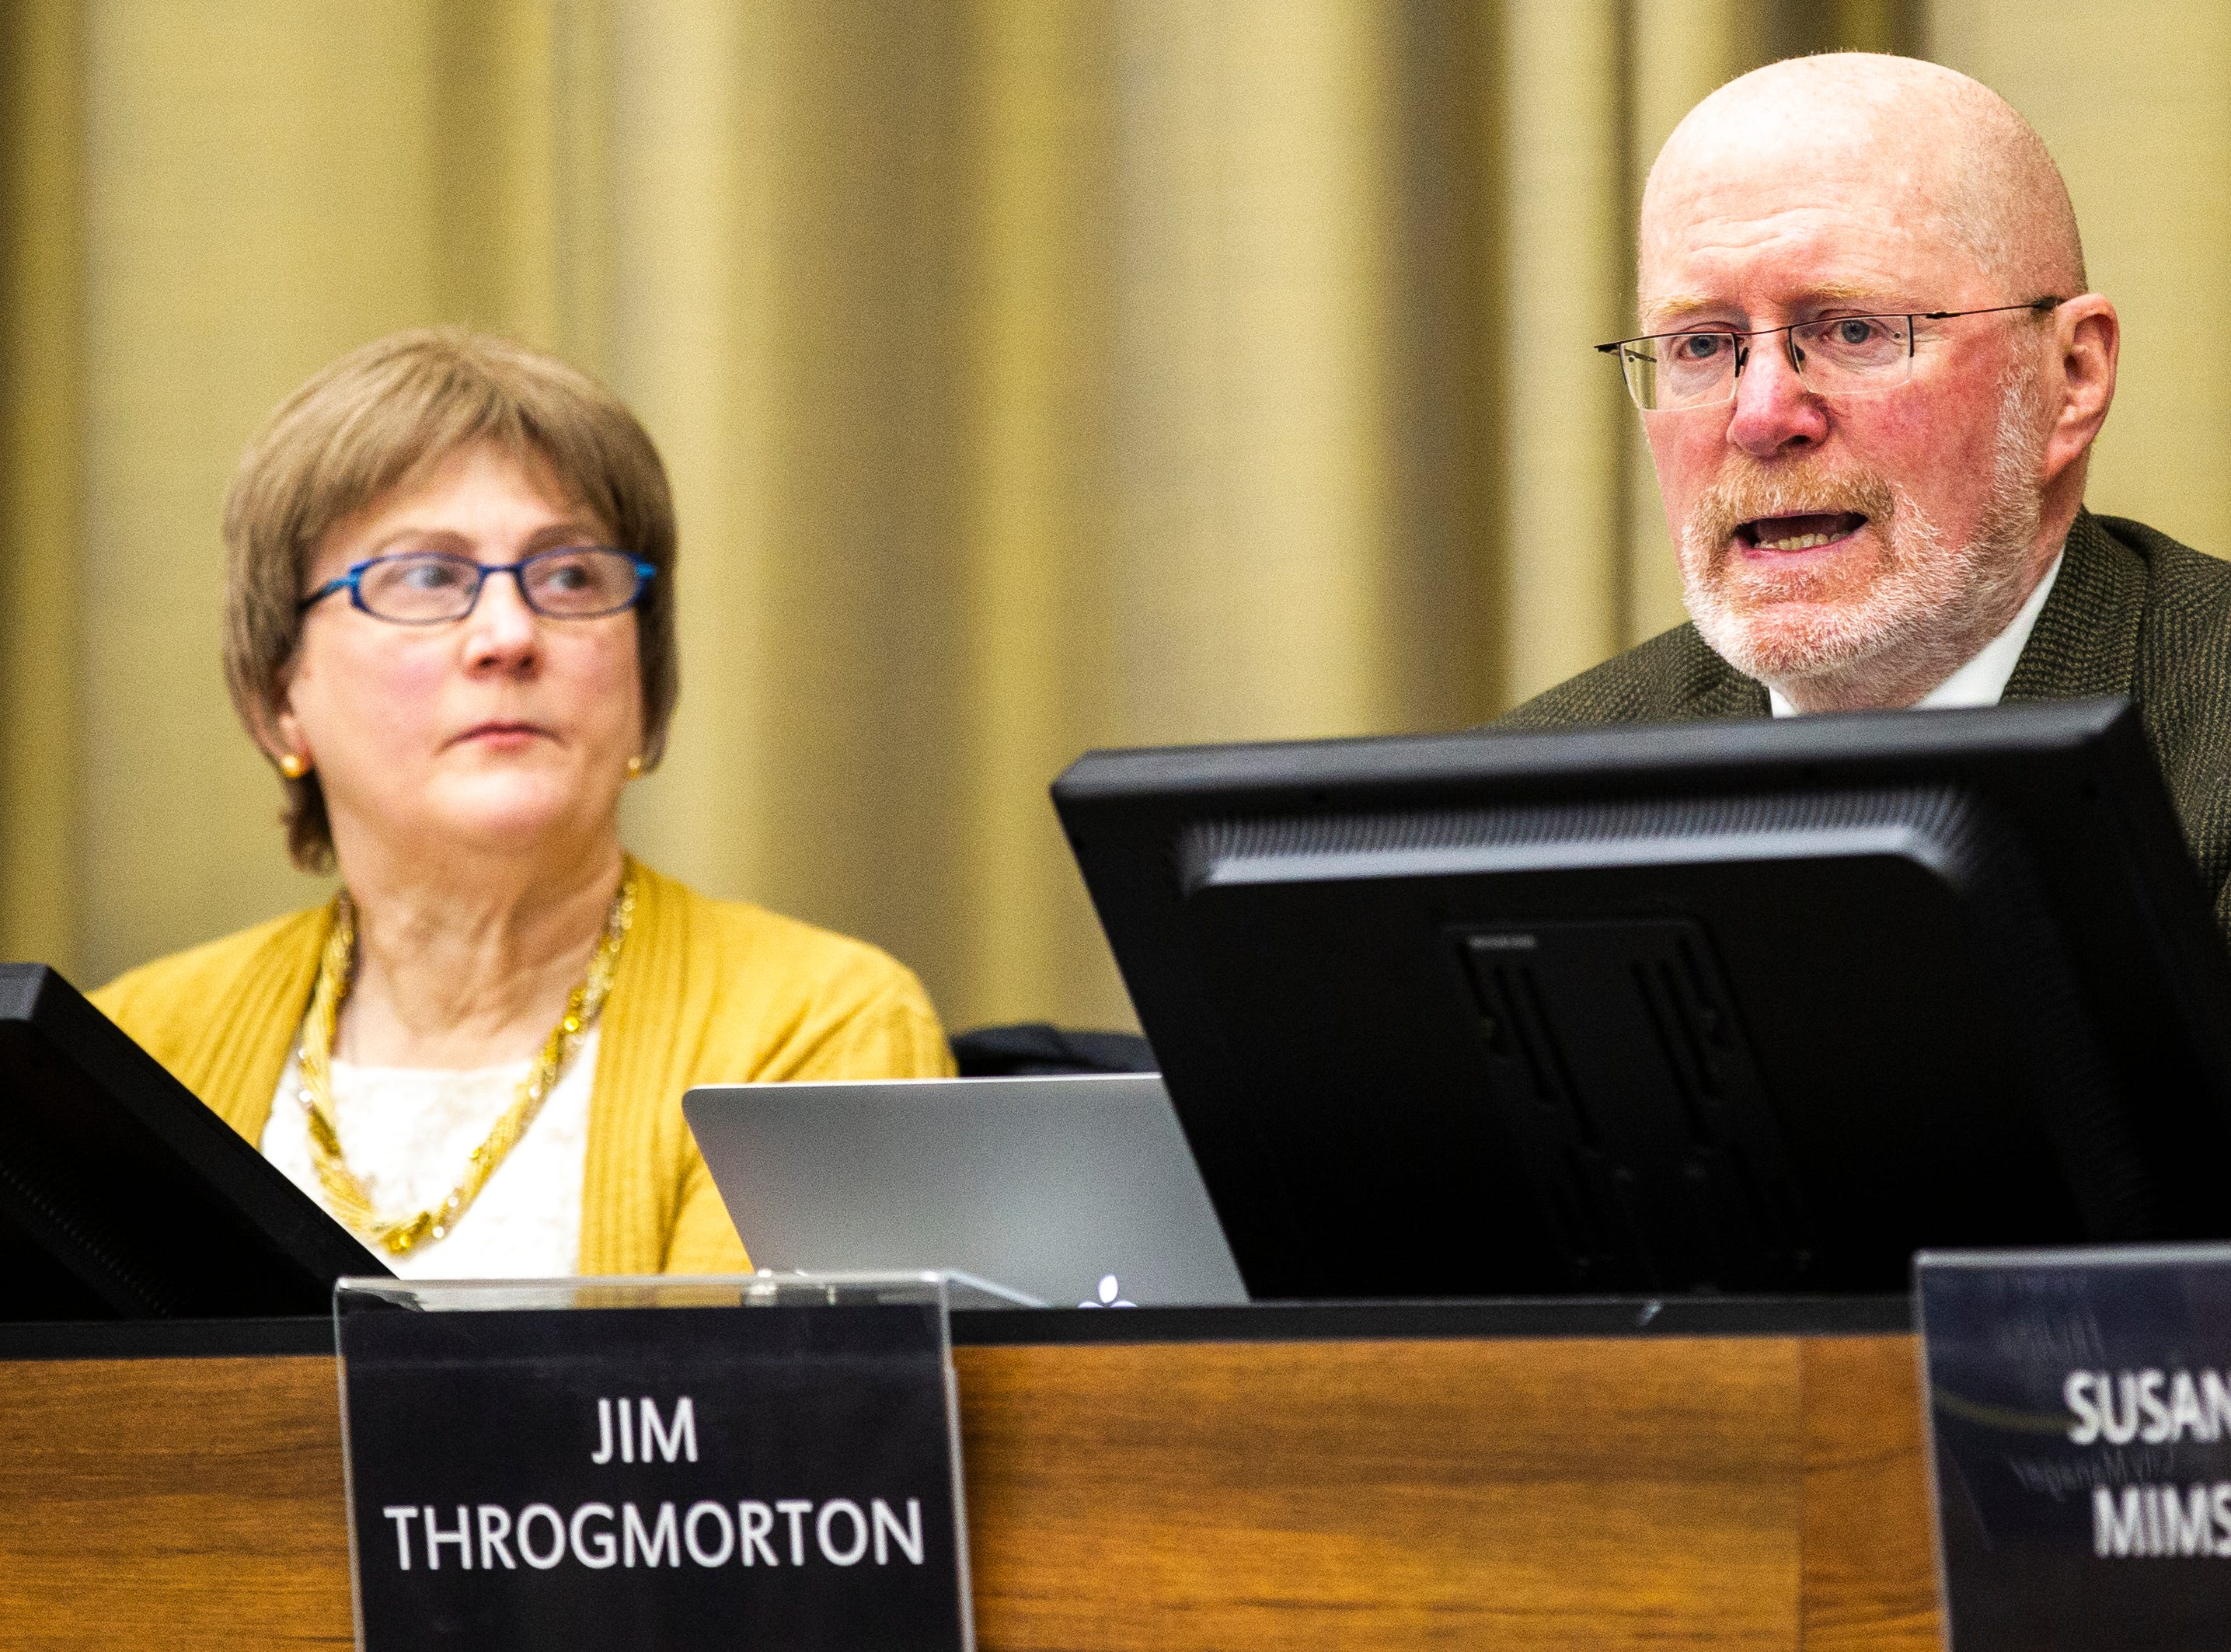 Iowa City Mayor Jim Throgmorton, right, speaks prior to public comment on Tuesday, Jan. 22, 2019, in Iowa City, Iowa.